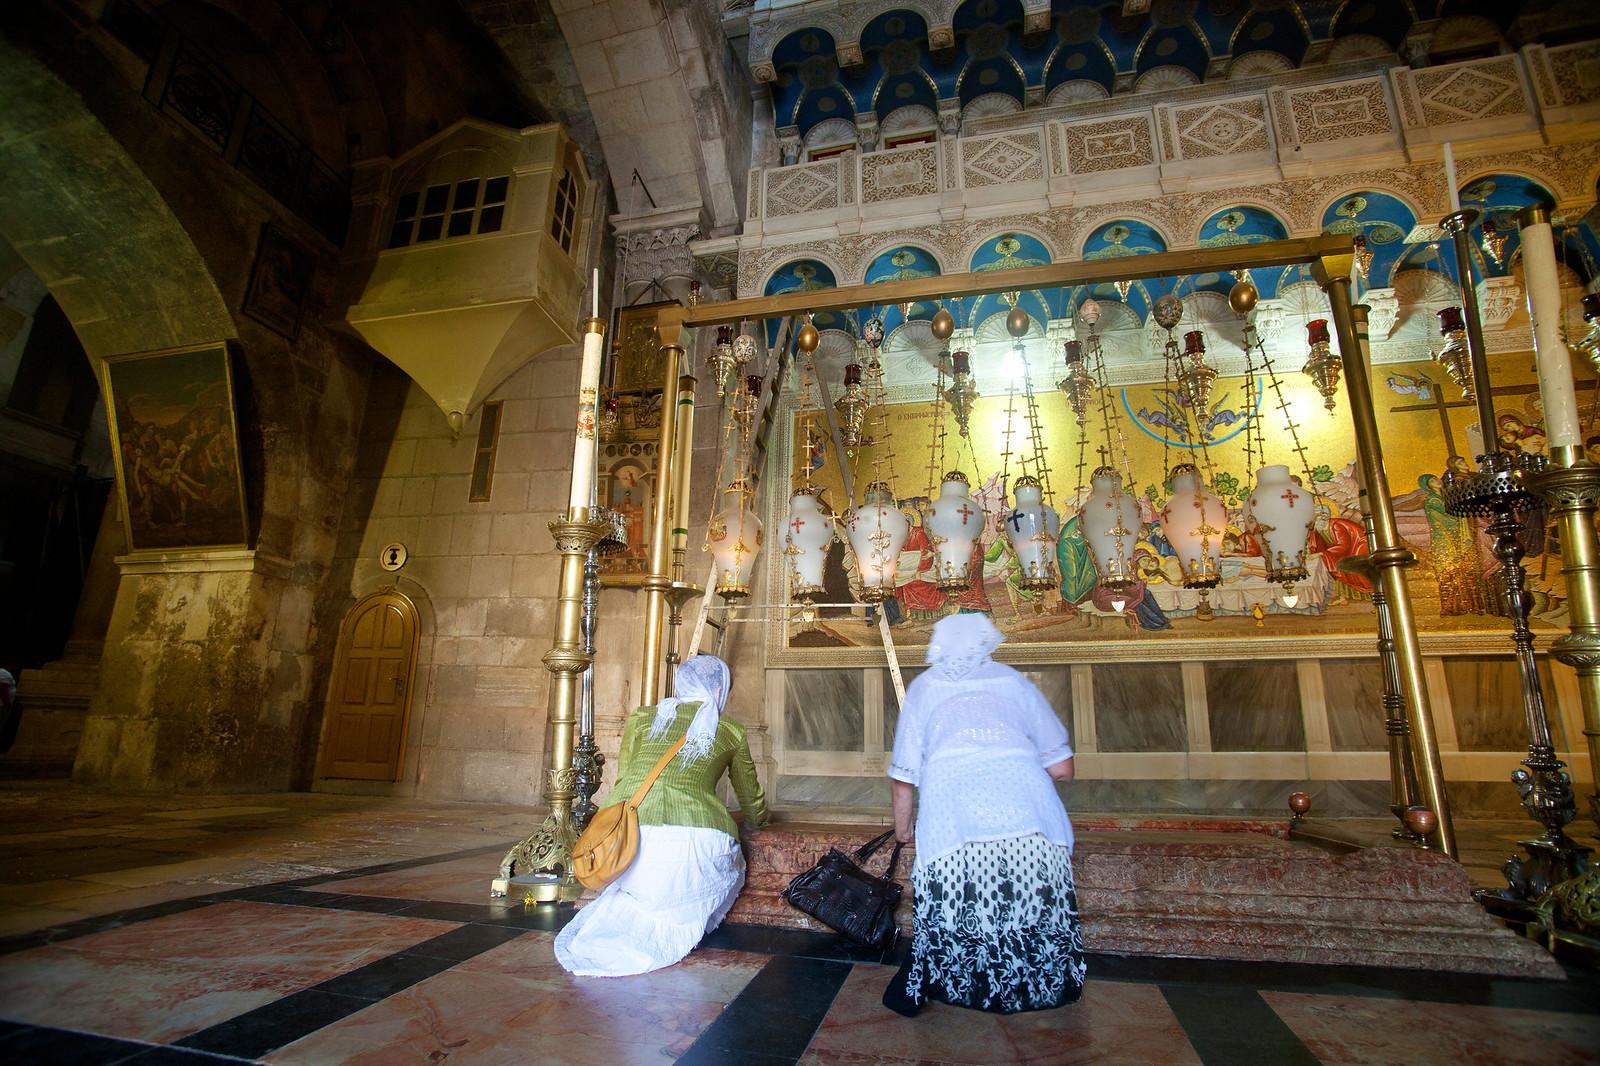 Jerusalem_Holy Sepulcher_The Anointing Stone (2)_Noam Chen_IMOT